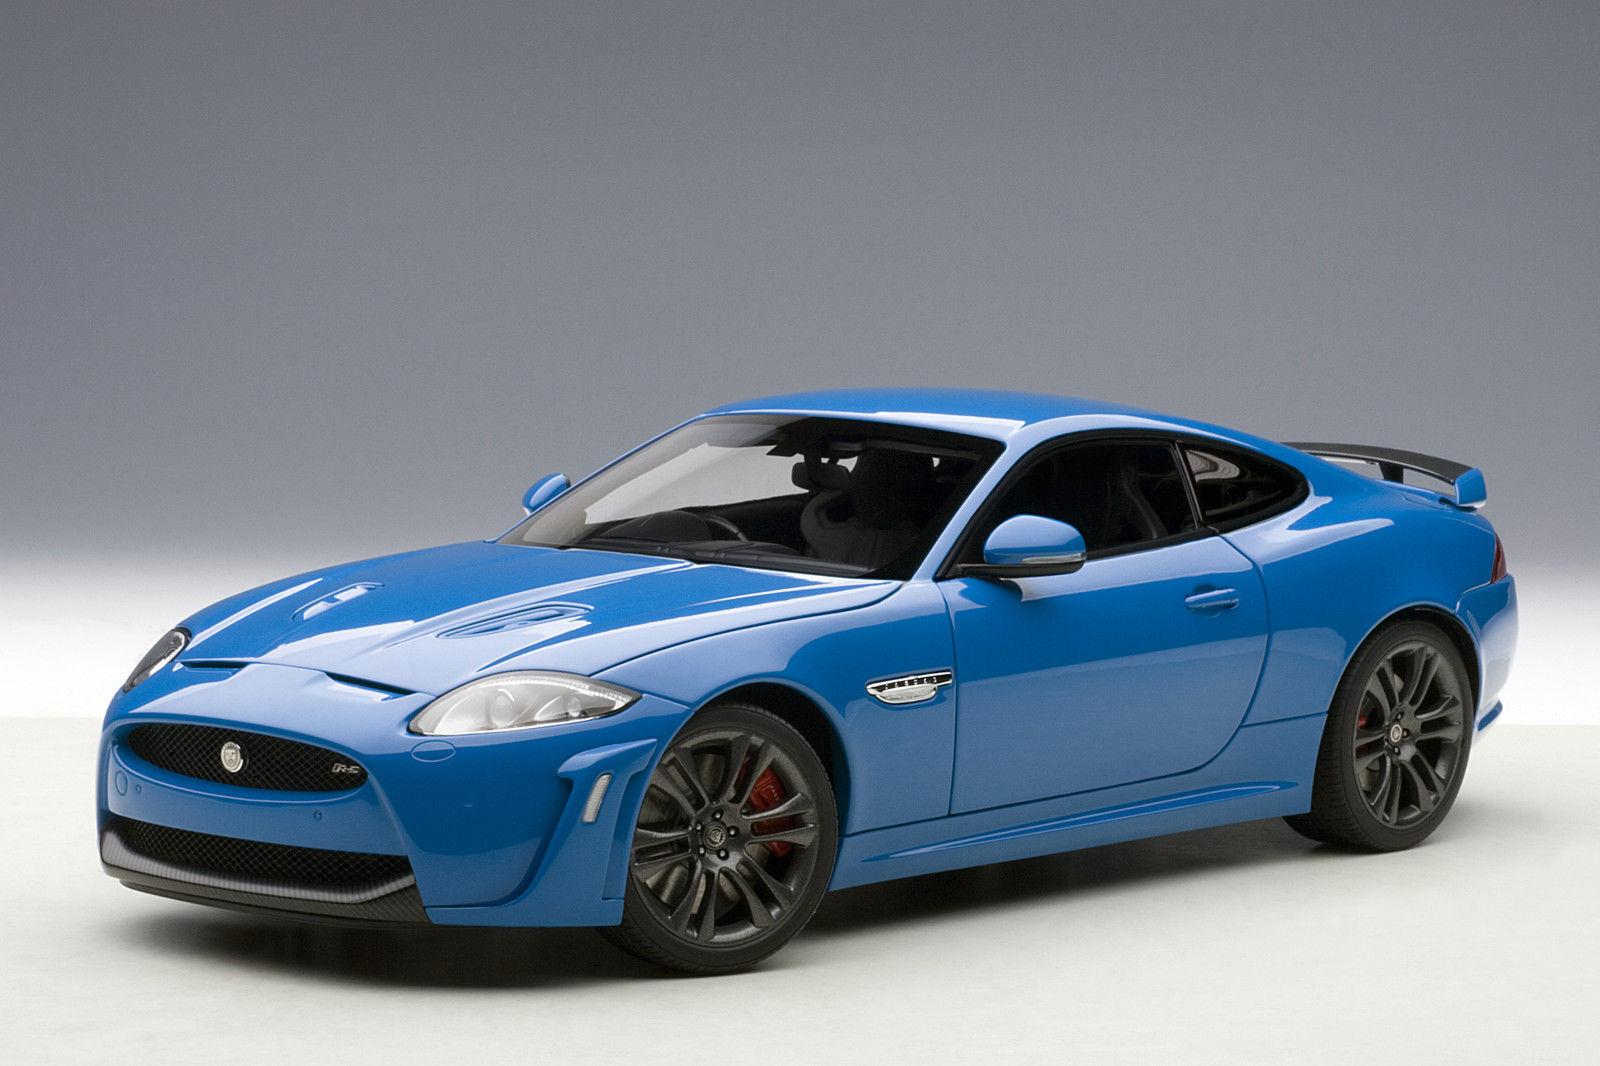 1 18 Autoart-JAGUAR XKR-S (French blu RACING)